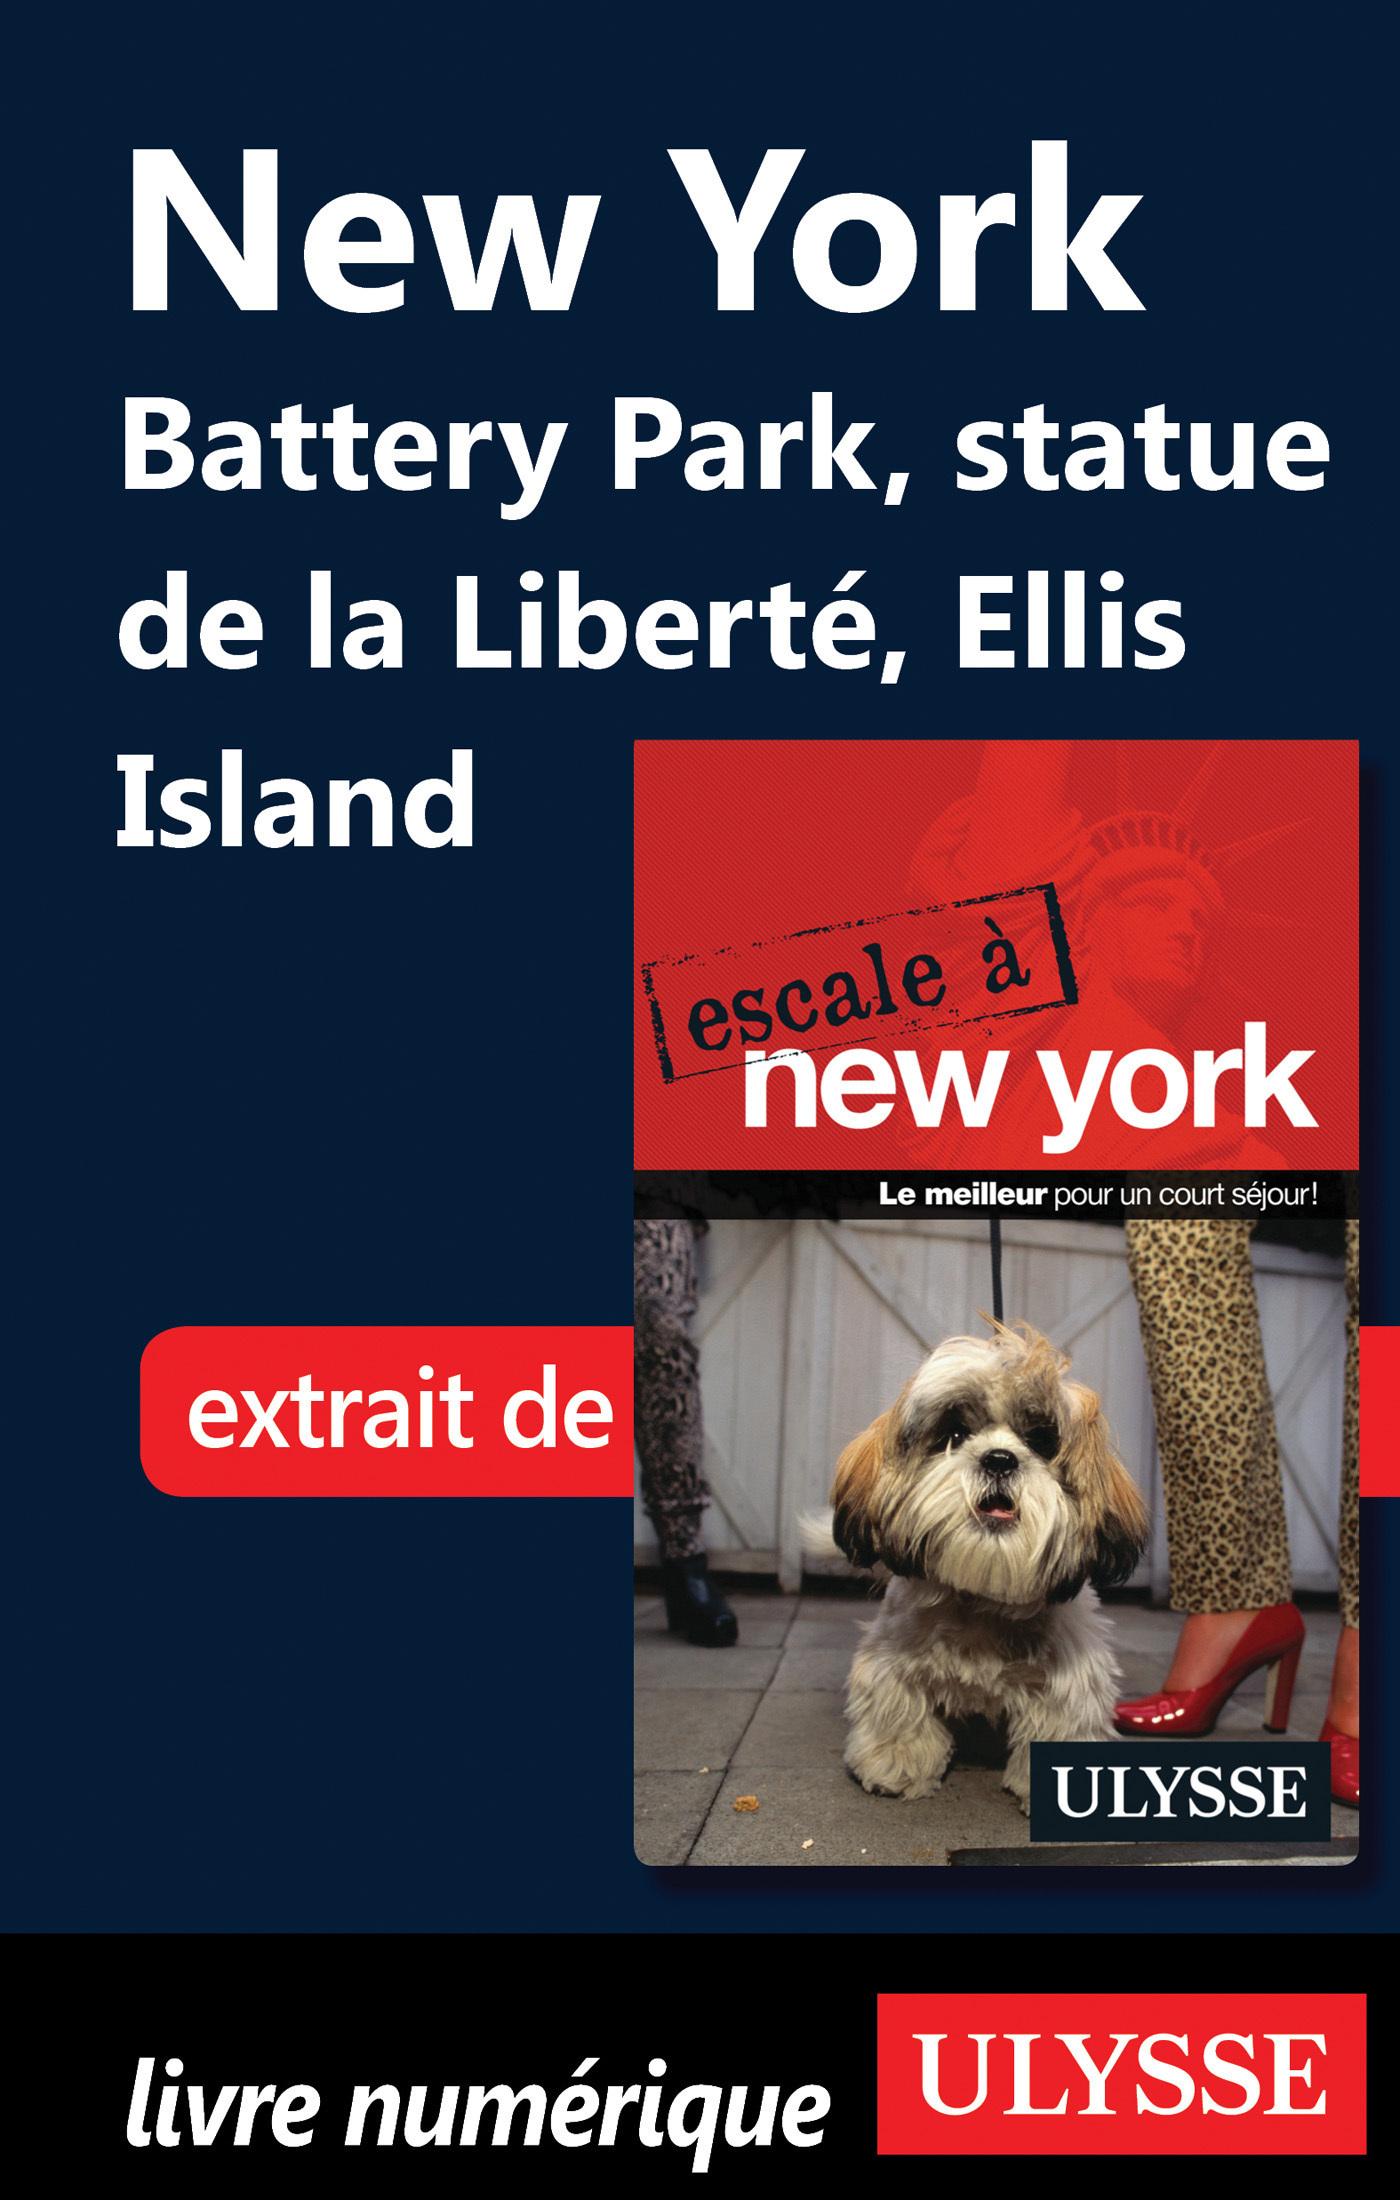 New York : Battery Park Statue de la Liberté Ellis Island